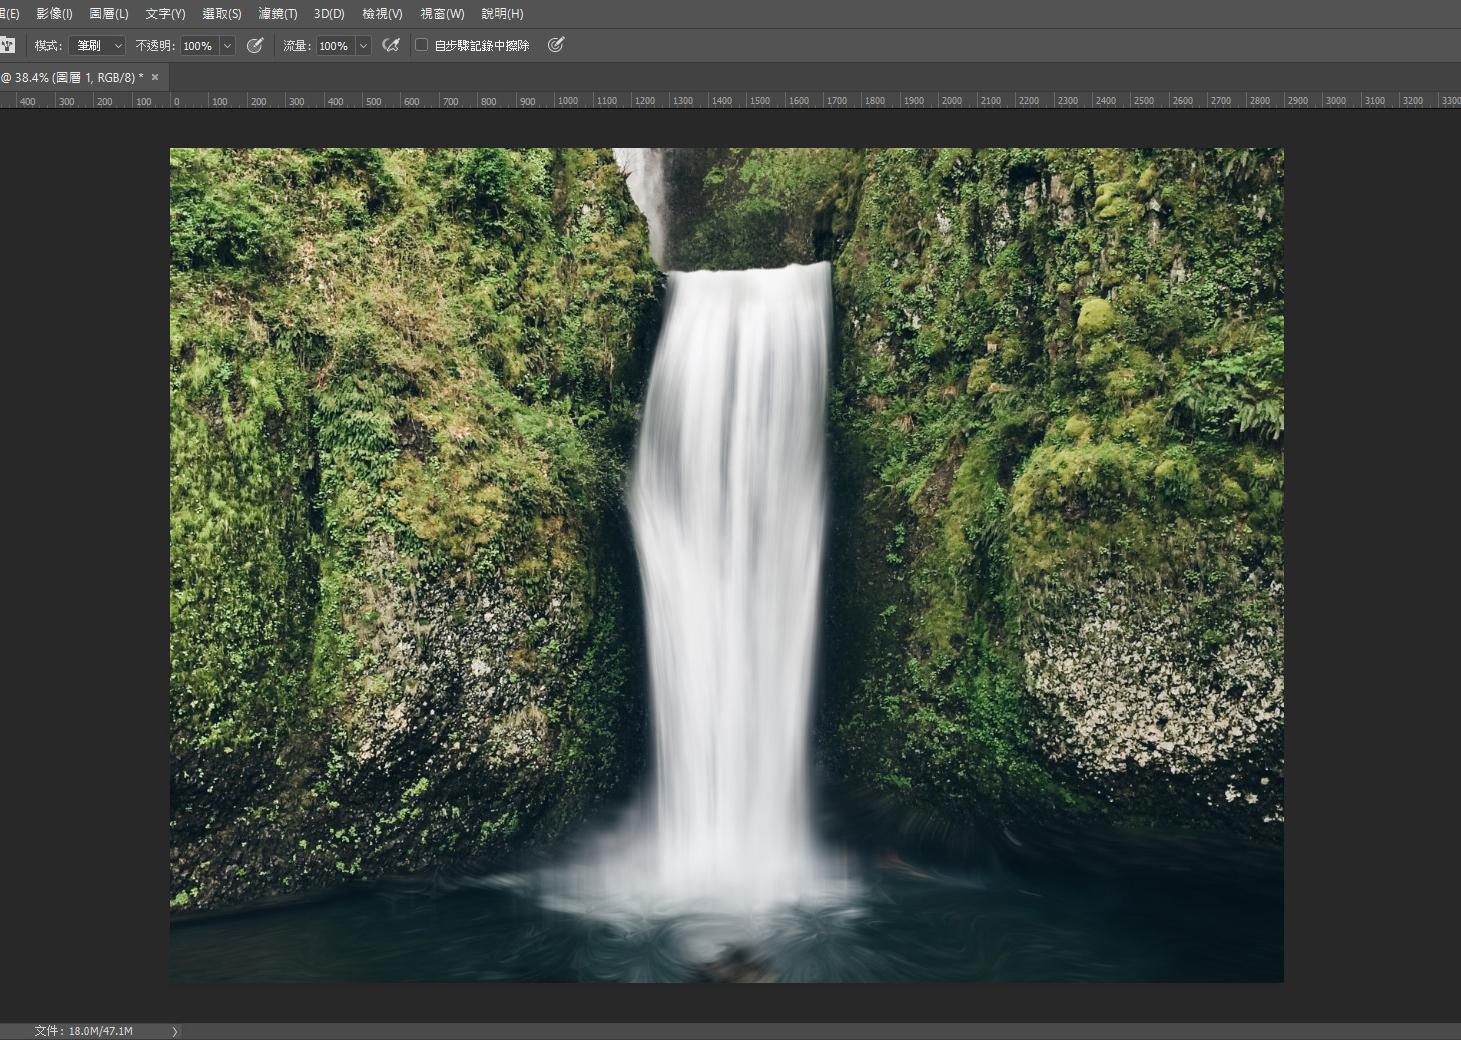 Photoshop - Path Blur Tool (18)